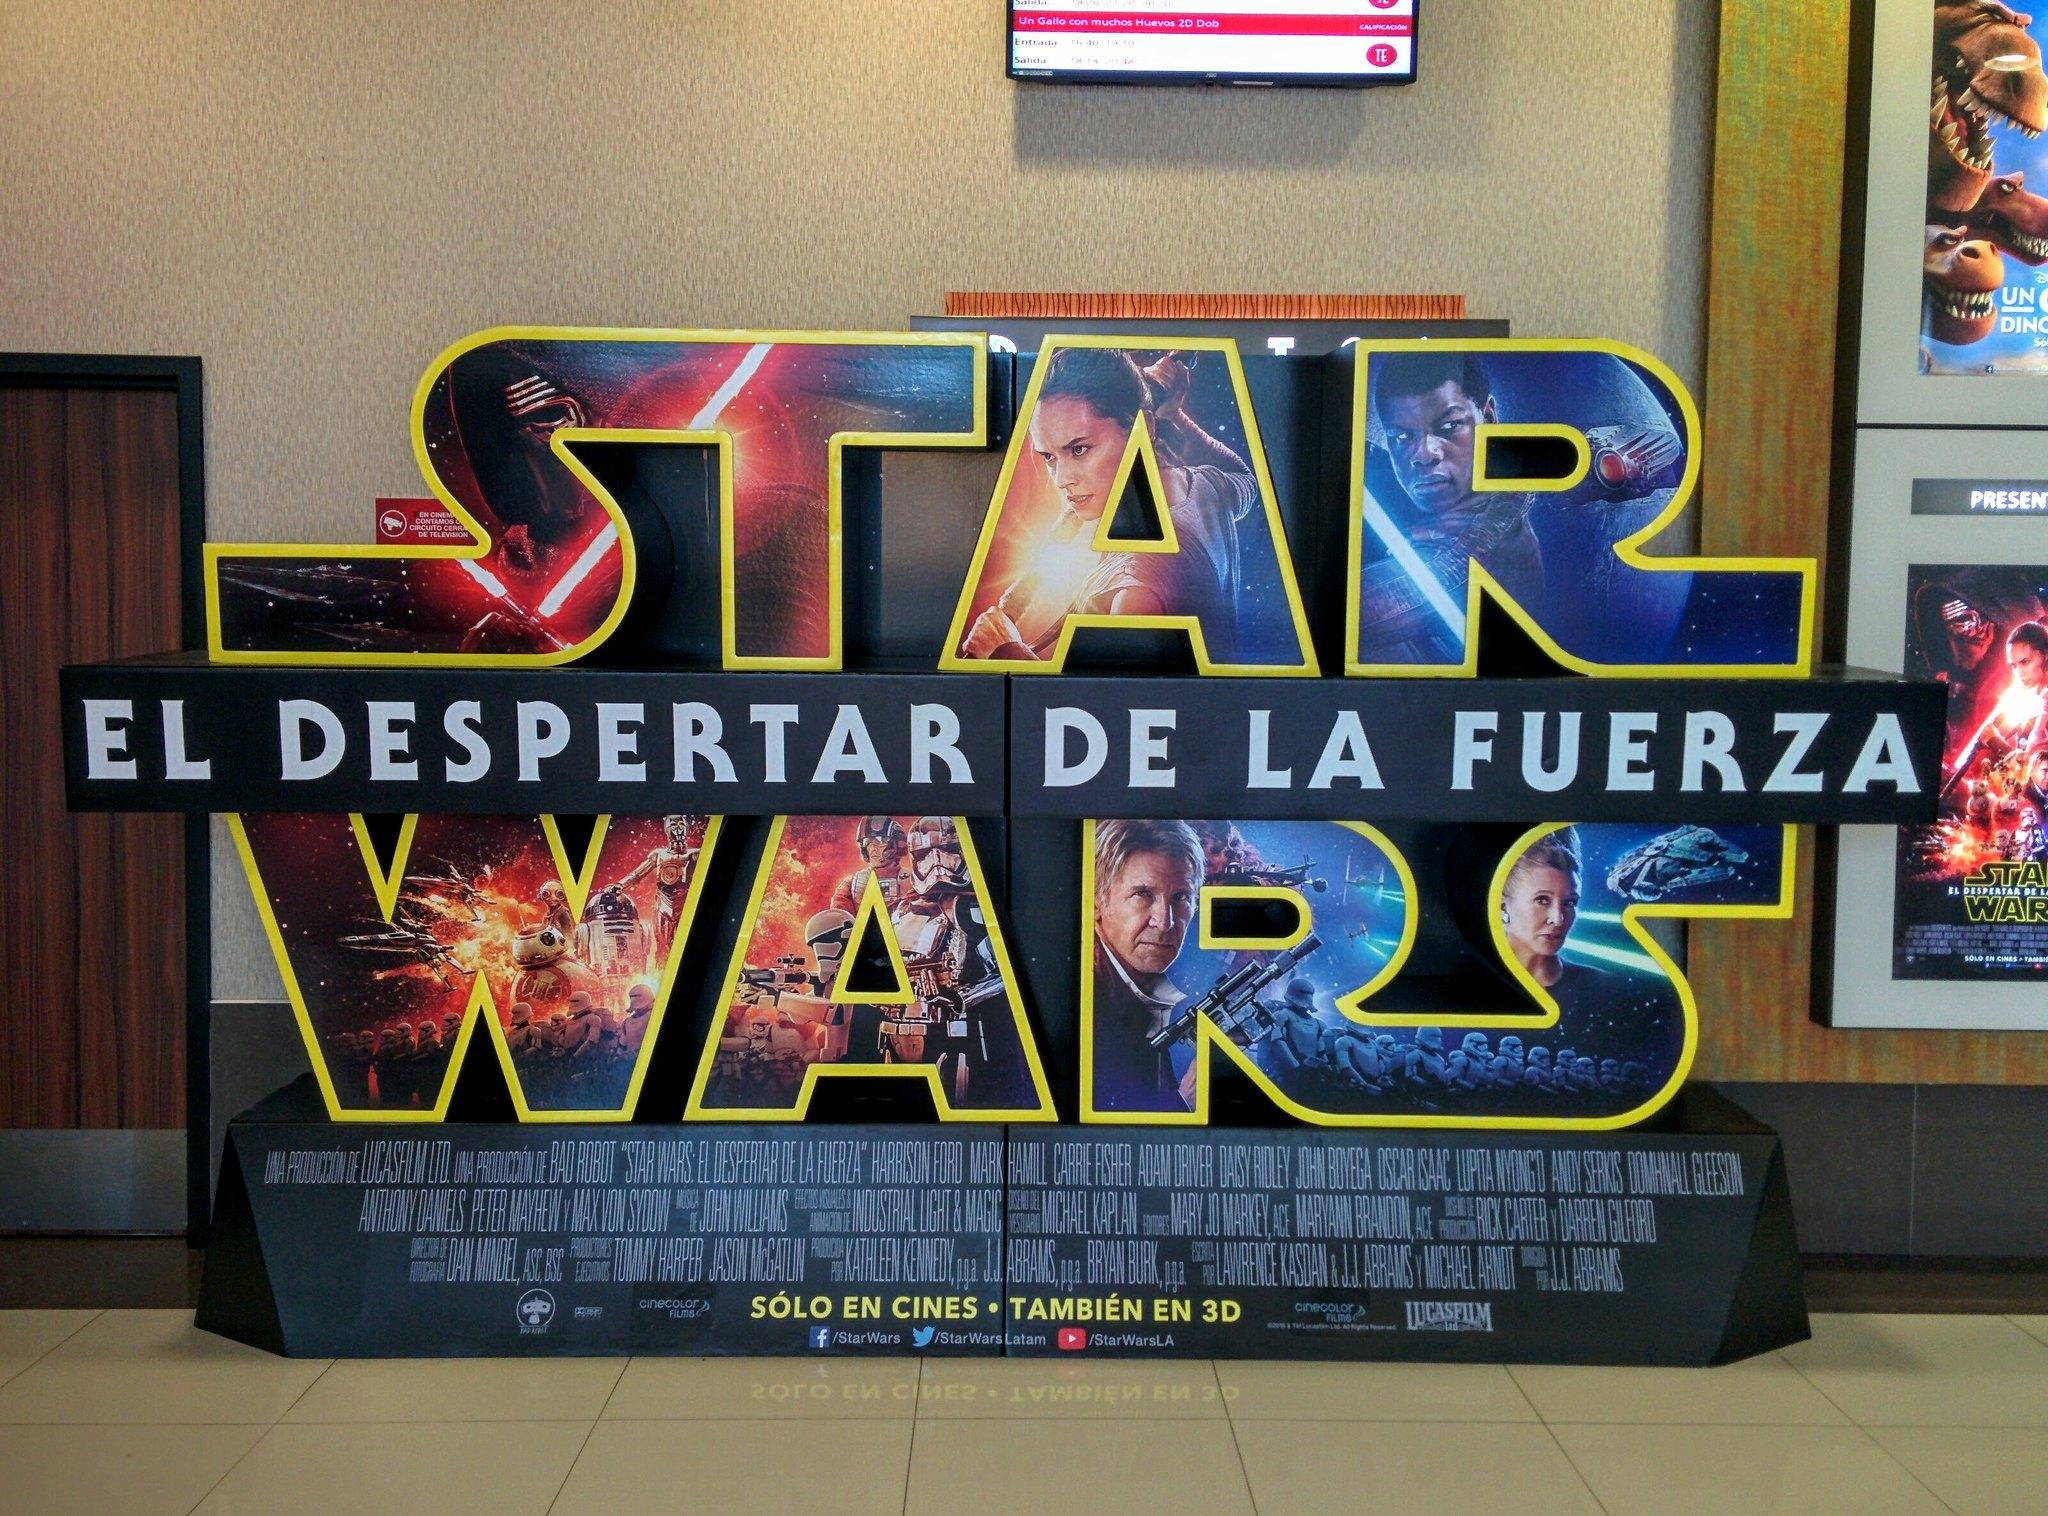 Star Wars sign in Bariloche